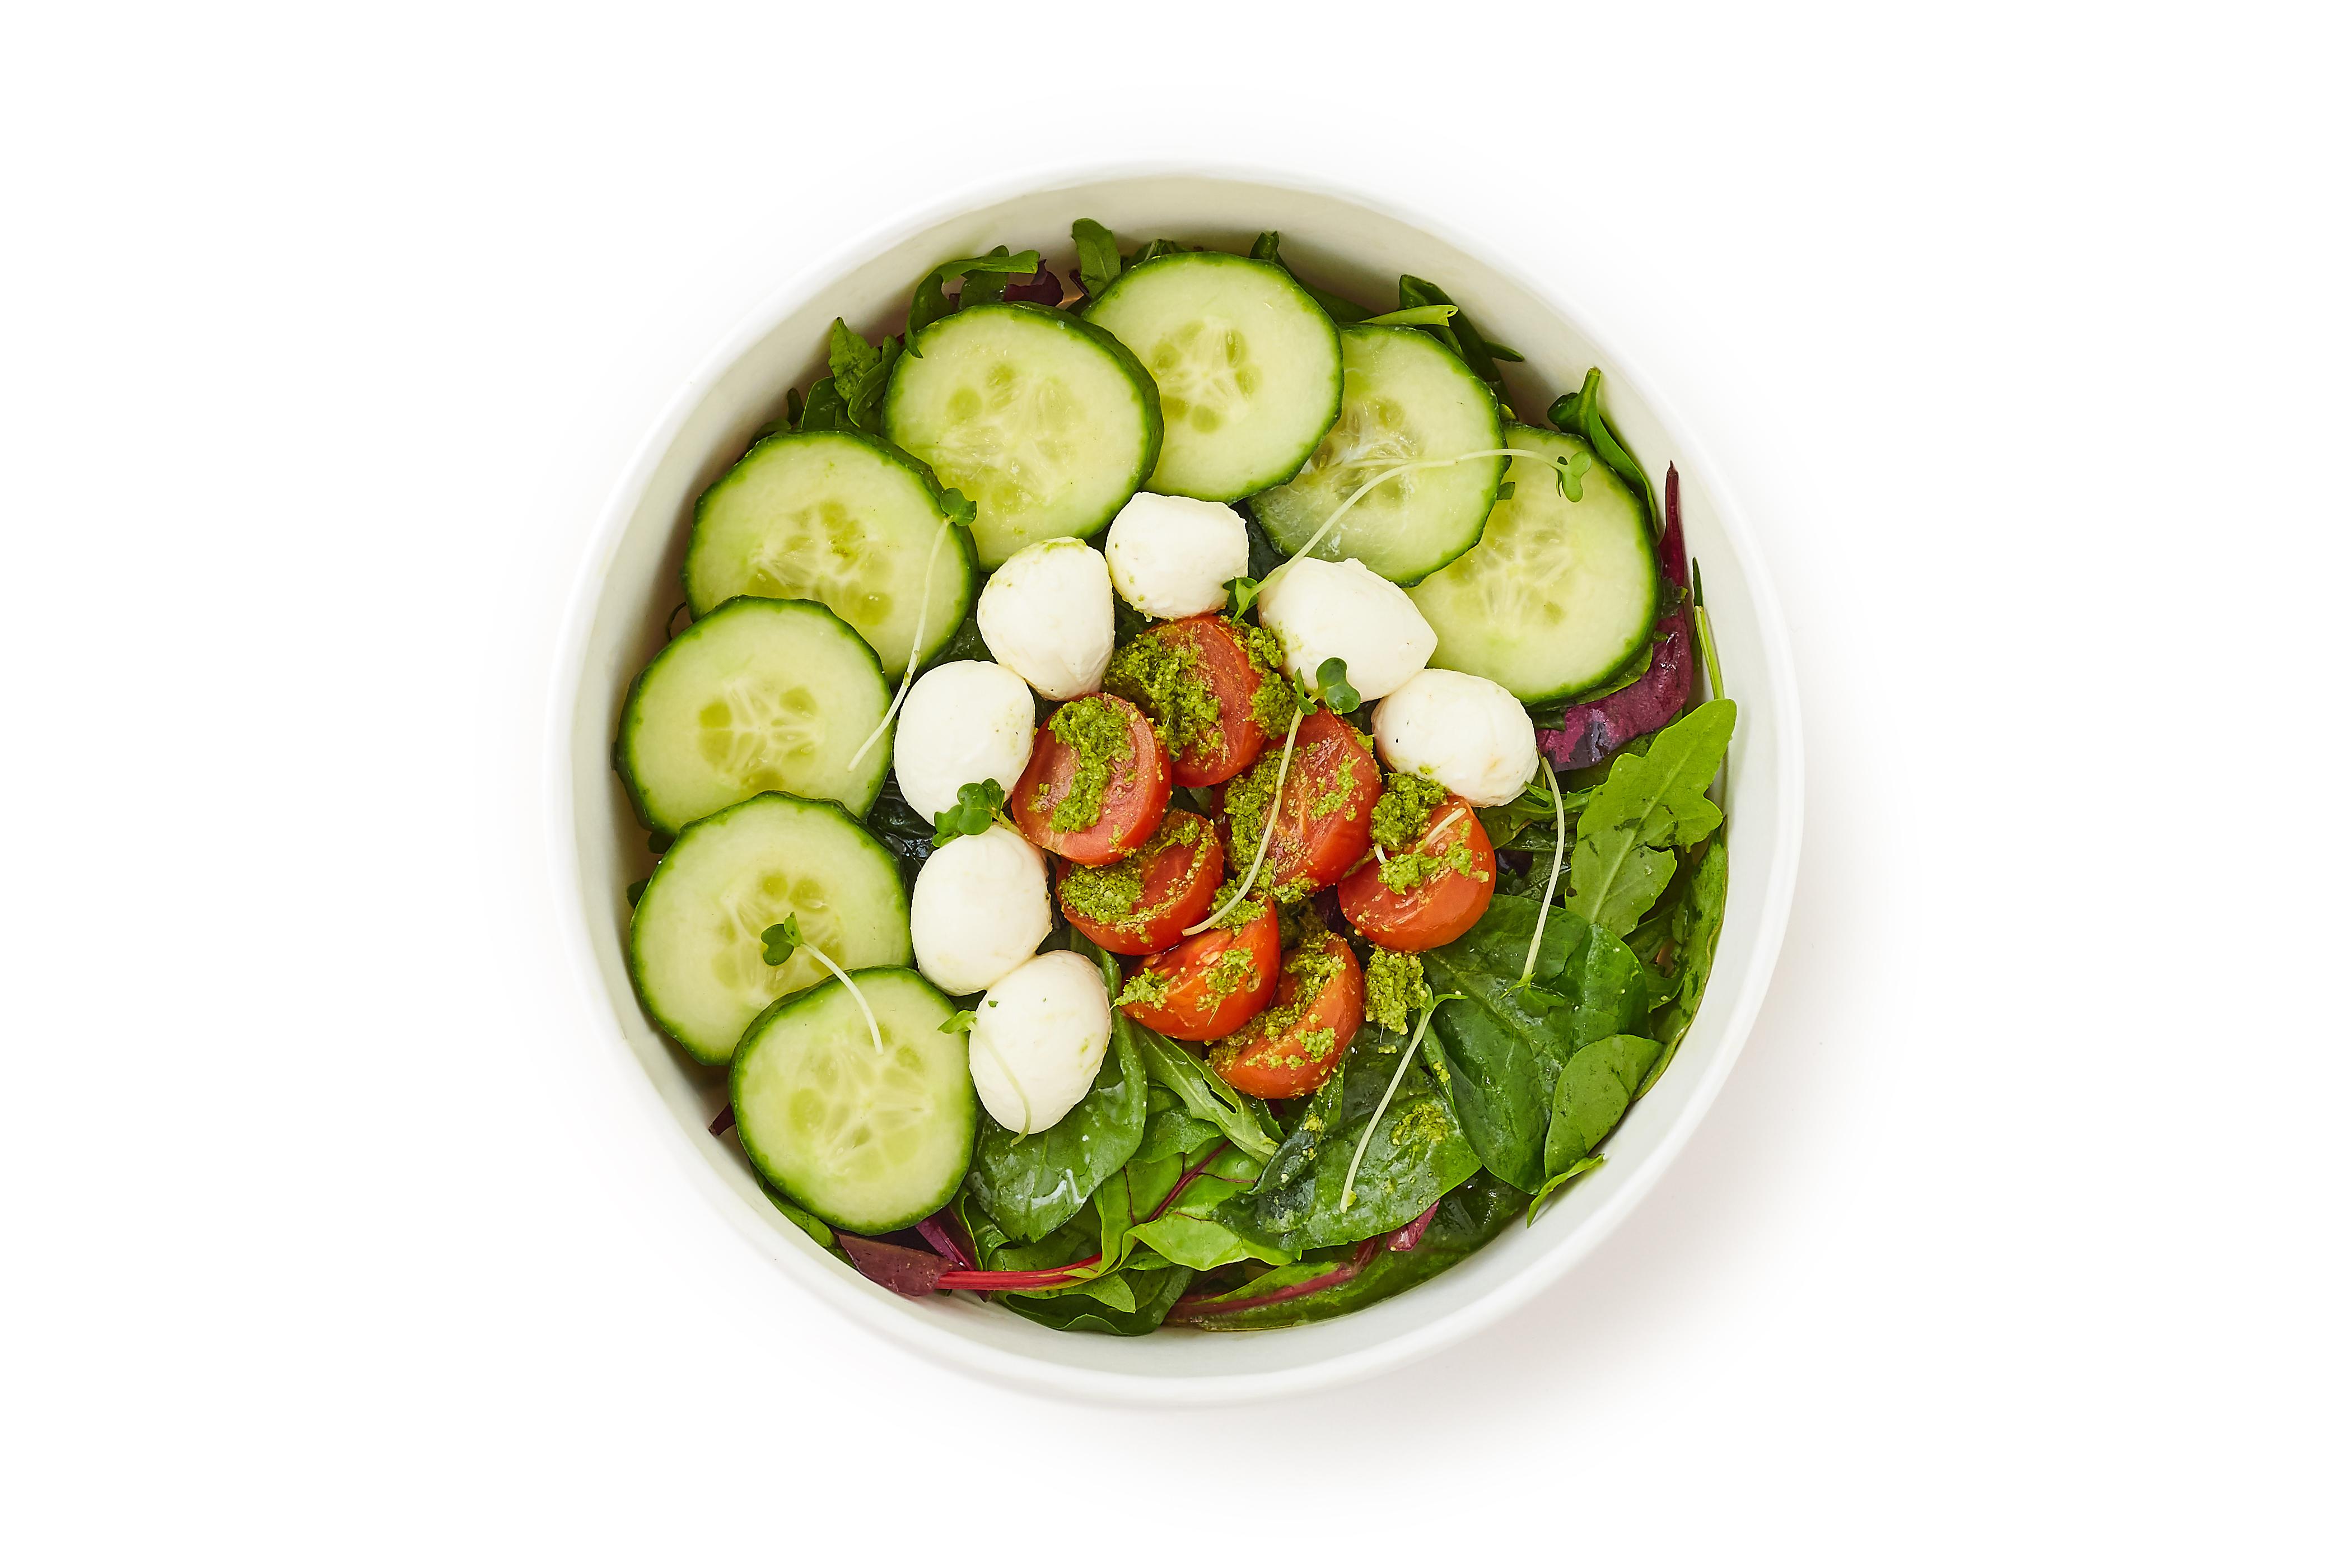 Mozzarella & Cherry Tomato Salad